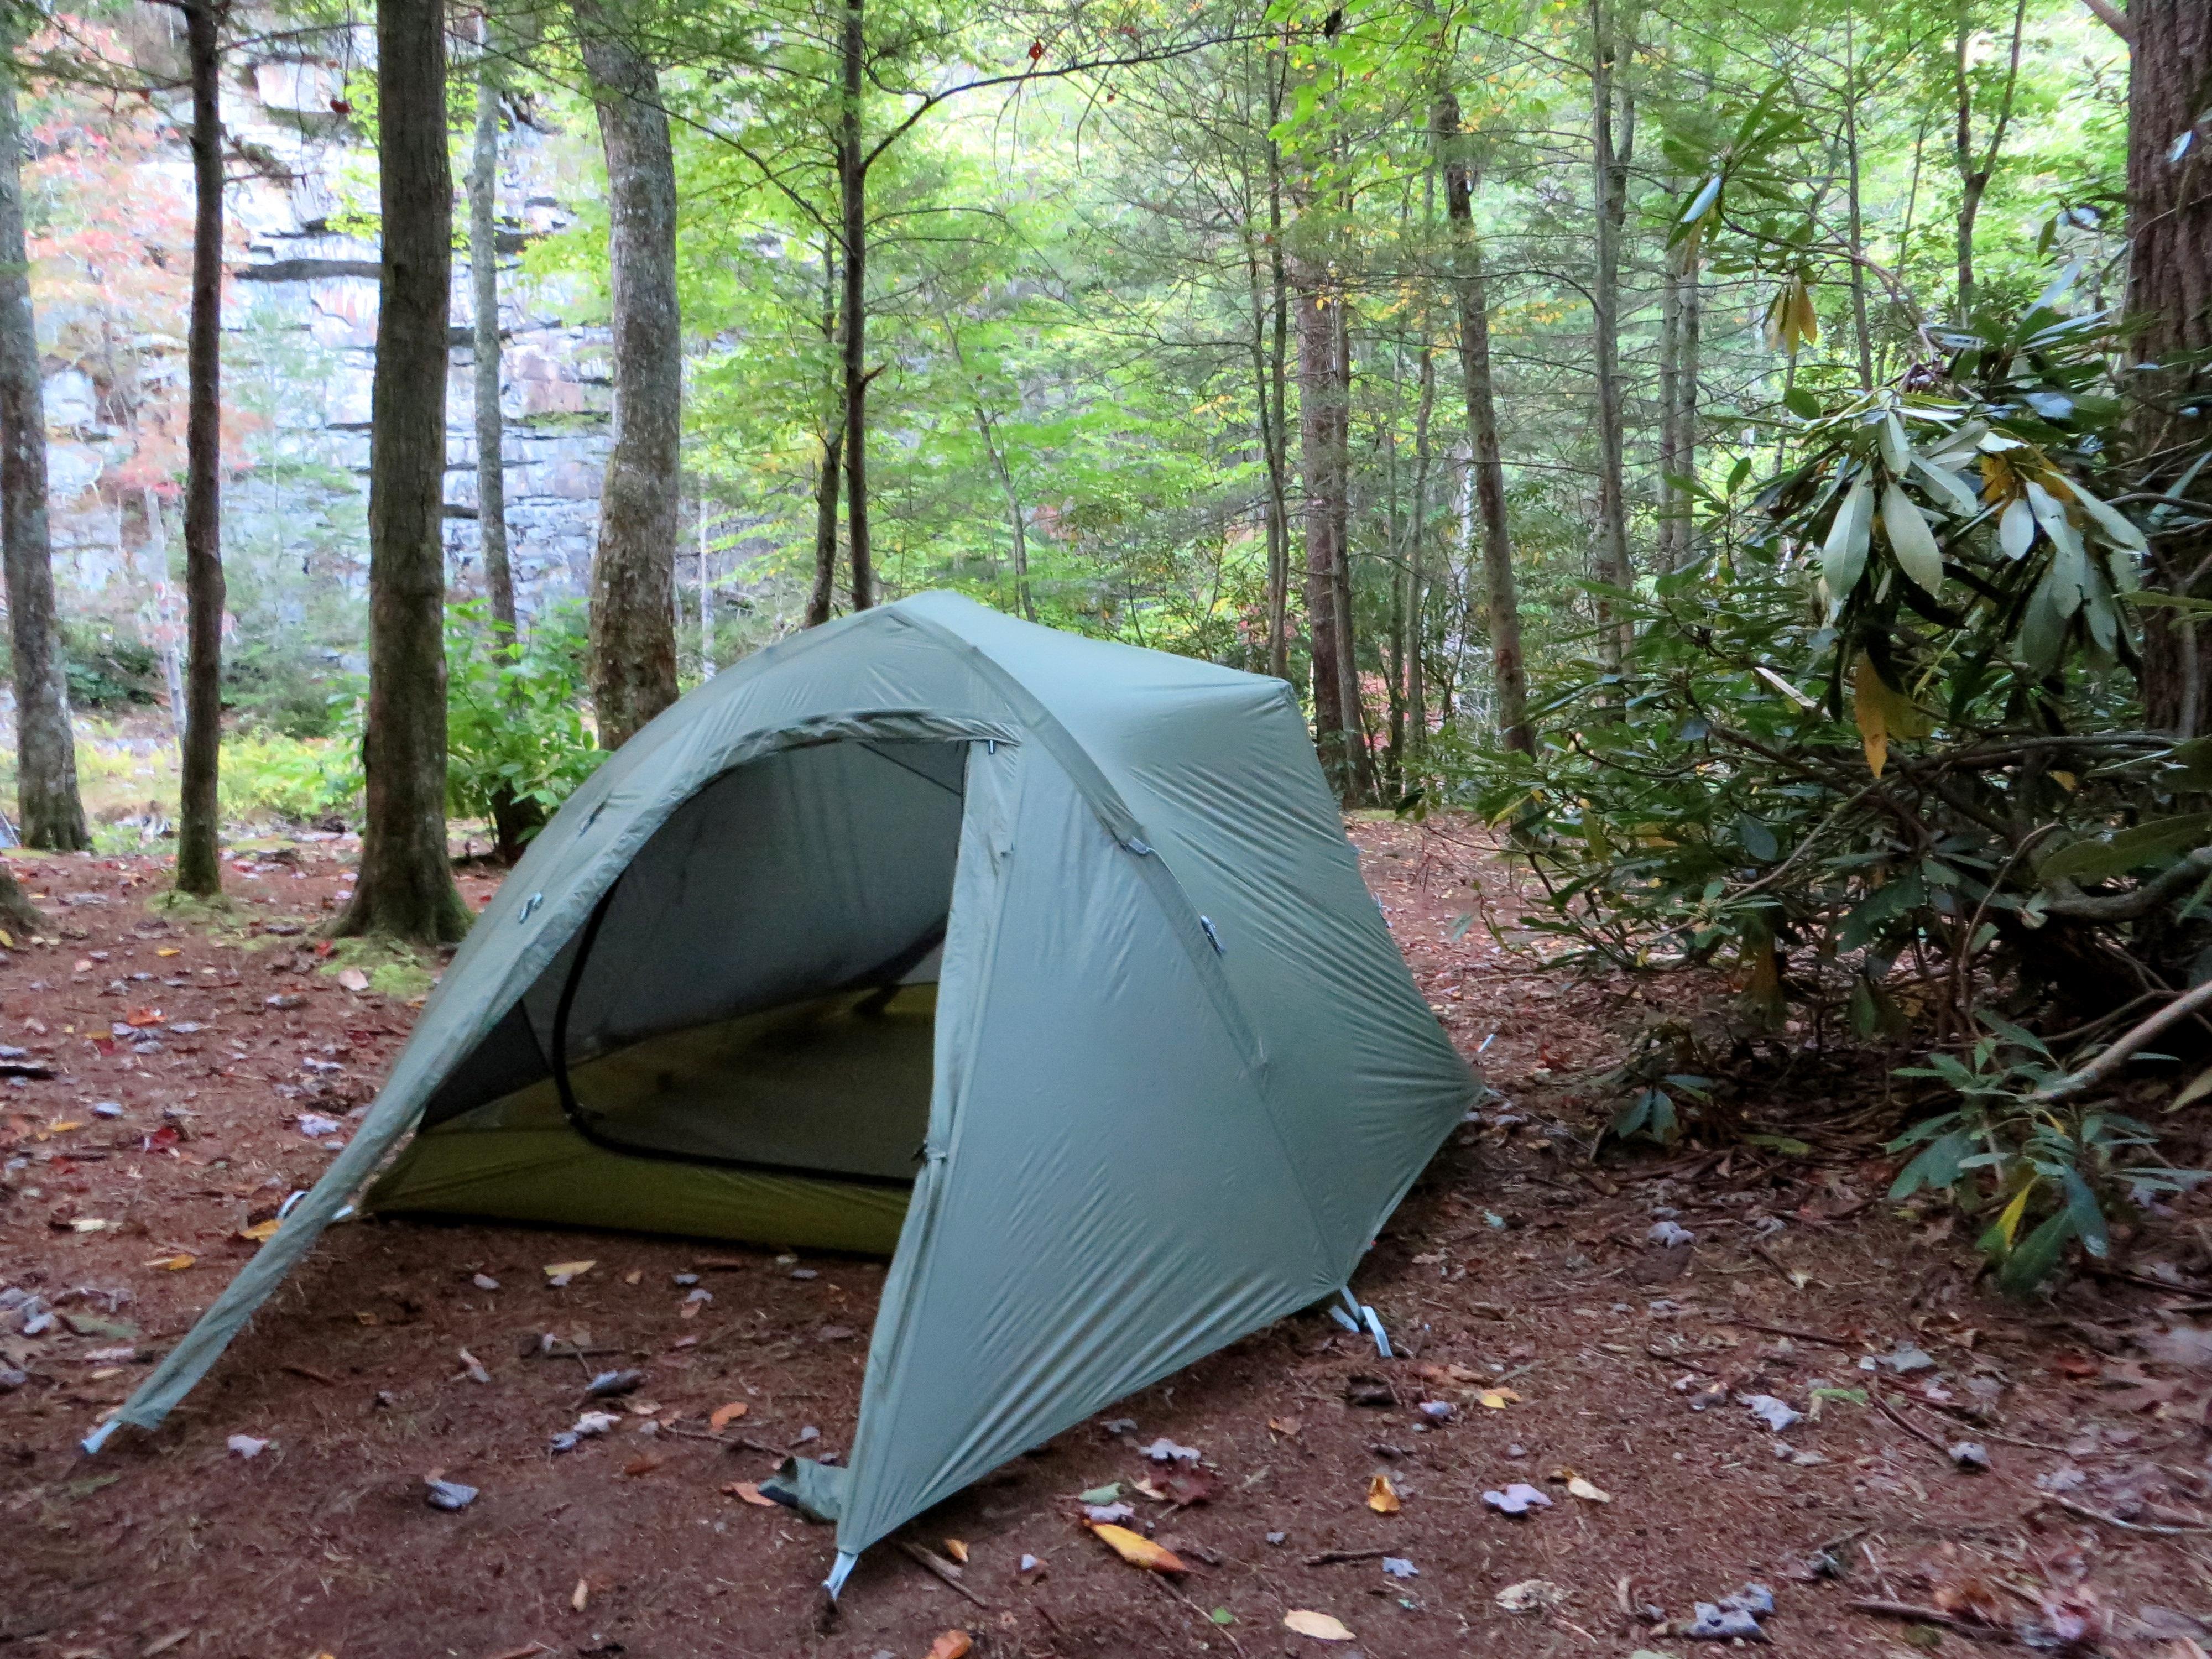 SlingFin 2LitetreelinebackpackerBig AGnes Seedhouse SL3backpacking tent reviewBig Agnes Rattlesnake SL2 mtn GLOMarmot Hammer 2pbackpacking gear tent ... & Gear reviews u2013 TreeLineBackpacker